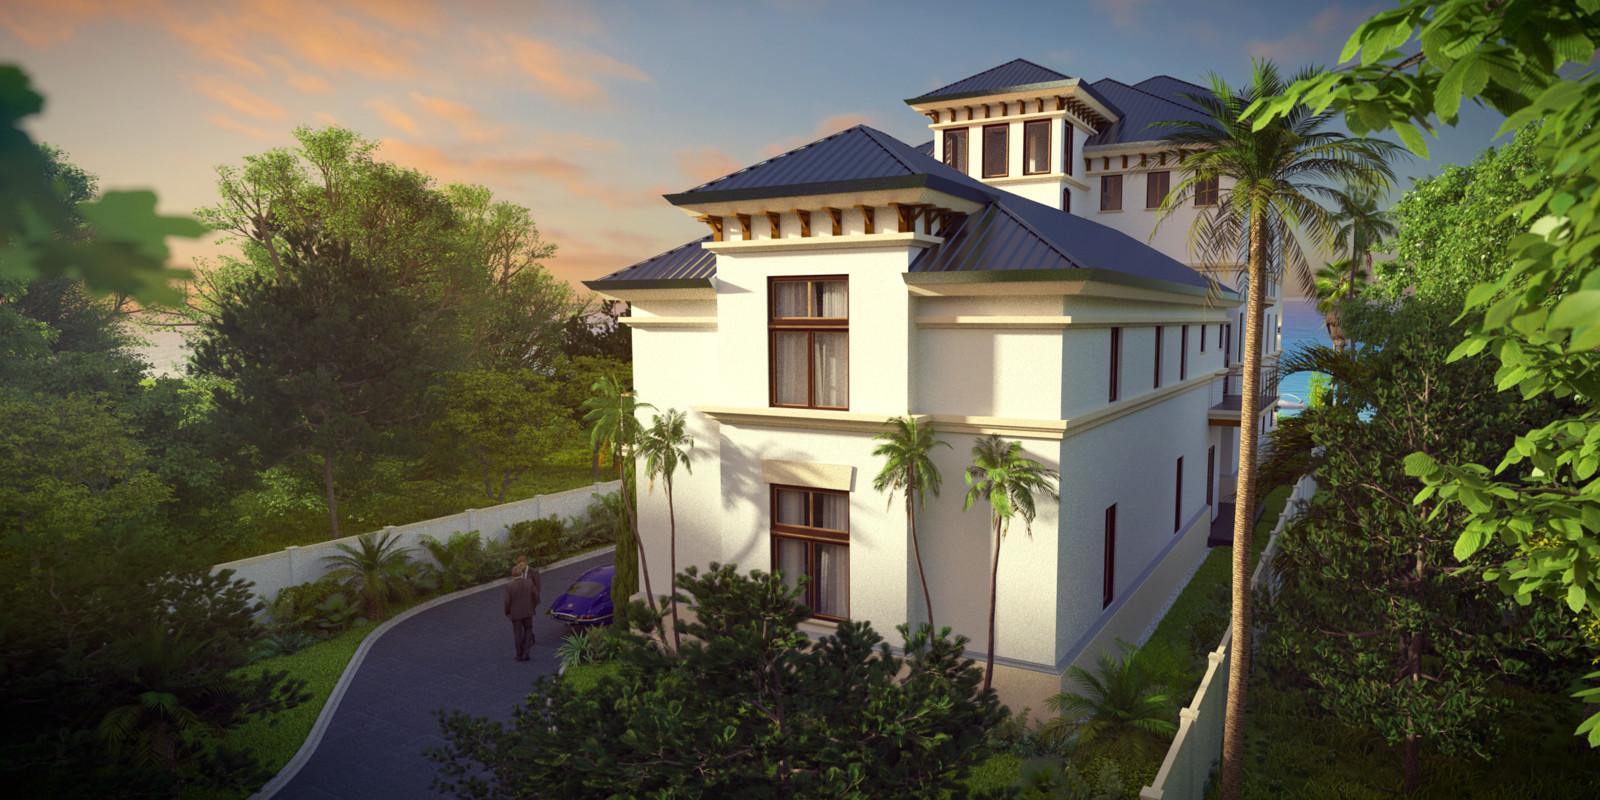 SketchUp + Thea Render  Seagrove Beach House: Scene 65 Studio 02 B Lumina Rise 2160 × 1080 Presto MC Bucket